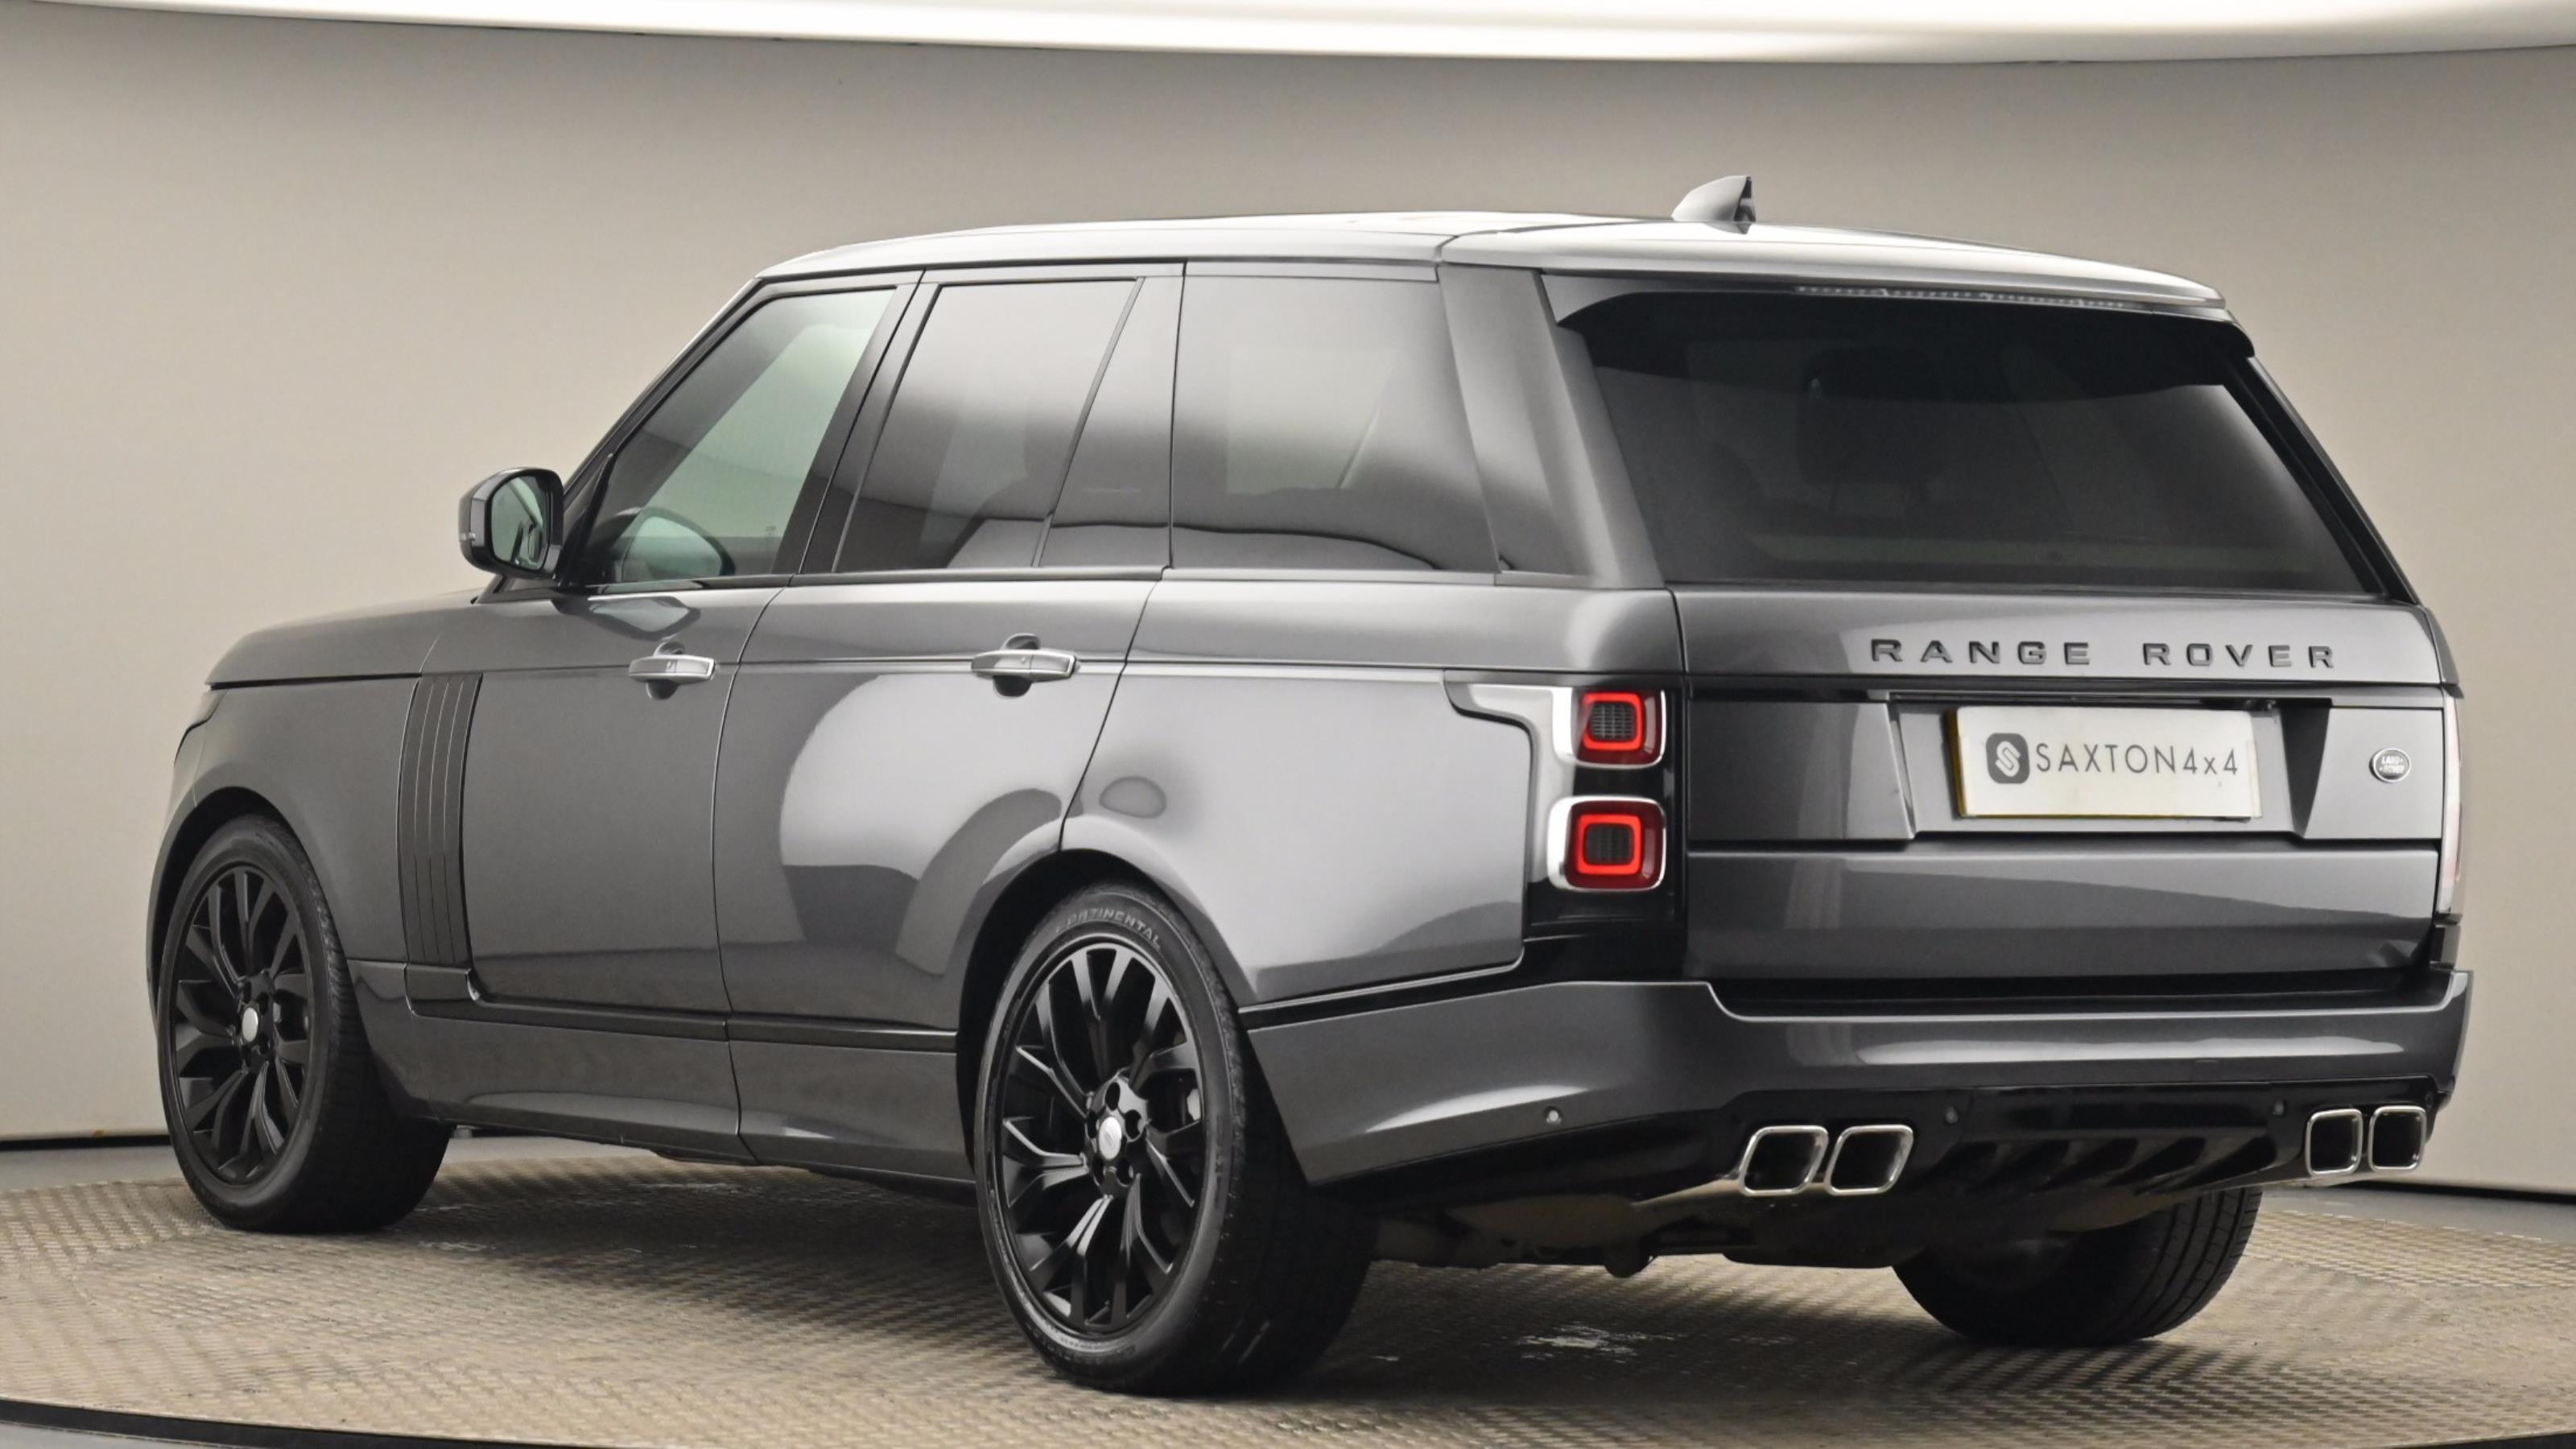 Used 2018 Land Rover RANGE ROVER 3.0 TDV6 Vogue SE 4dr Auto GREY at Saxton4x4